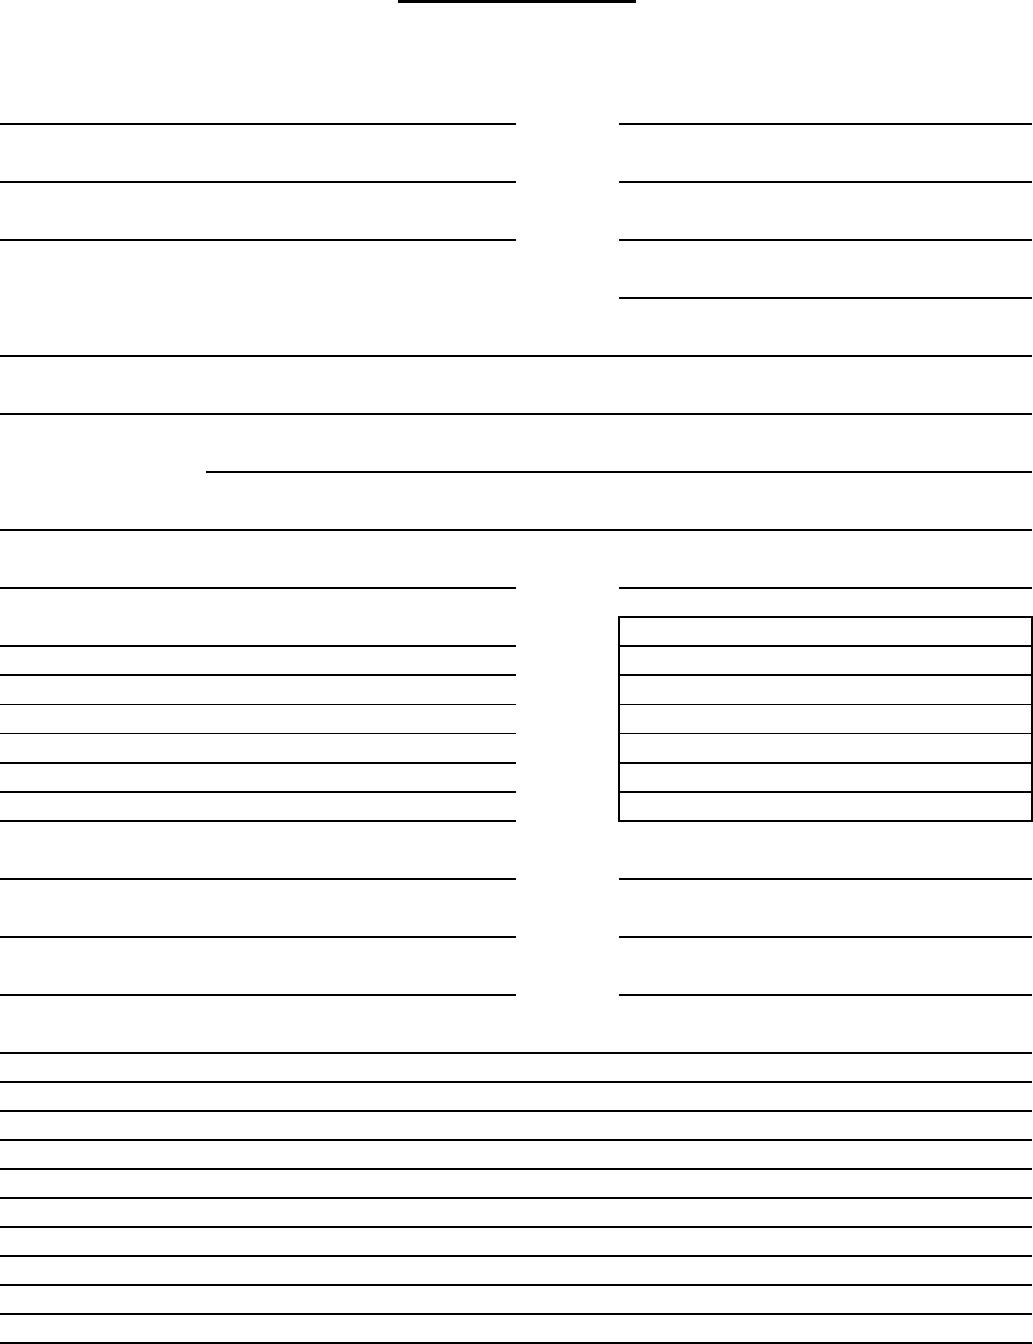 phone call log form